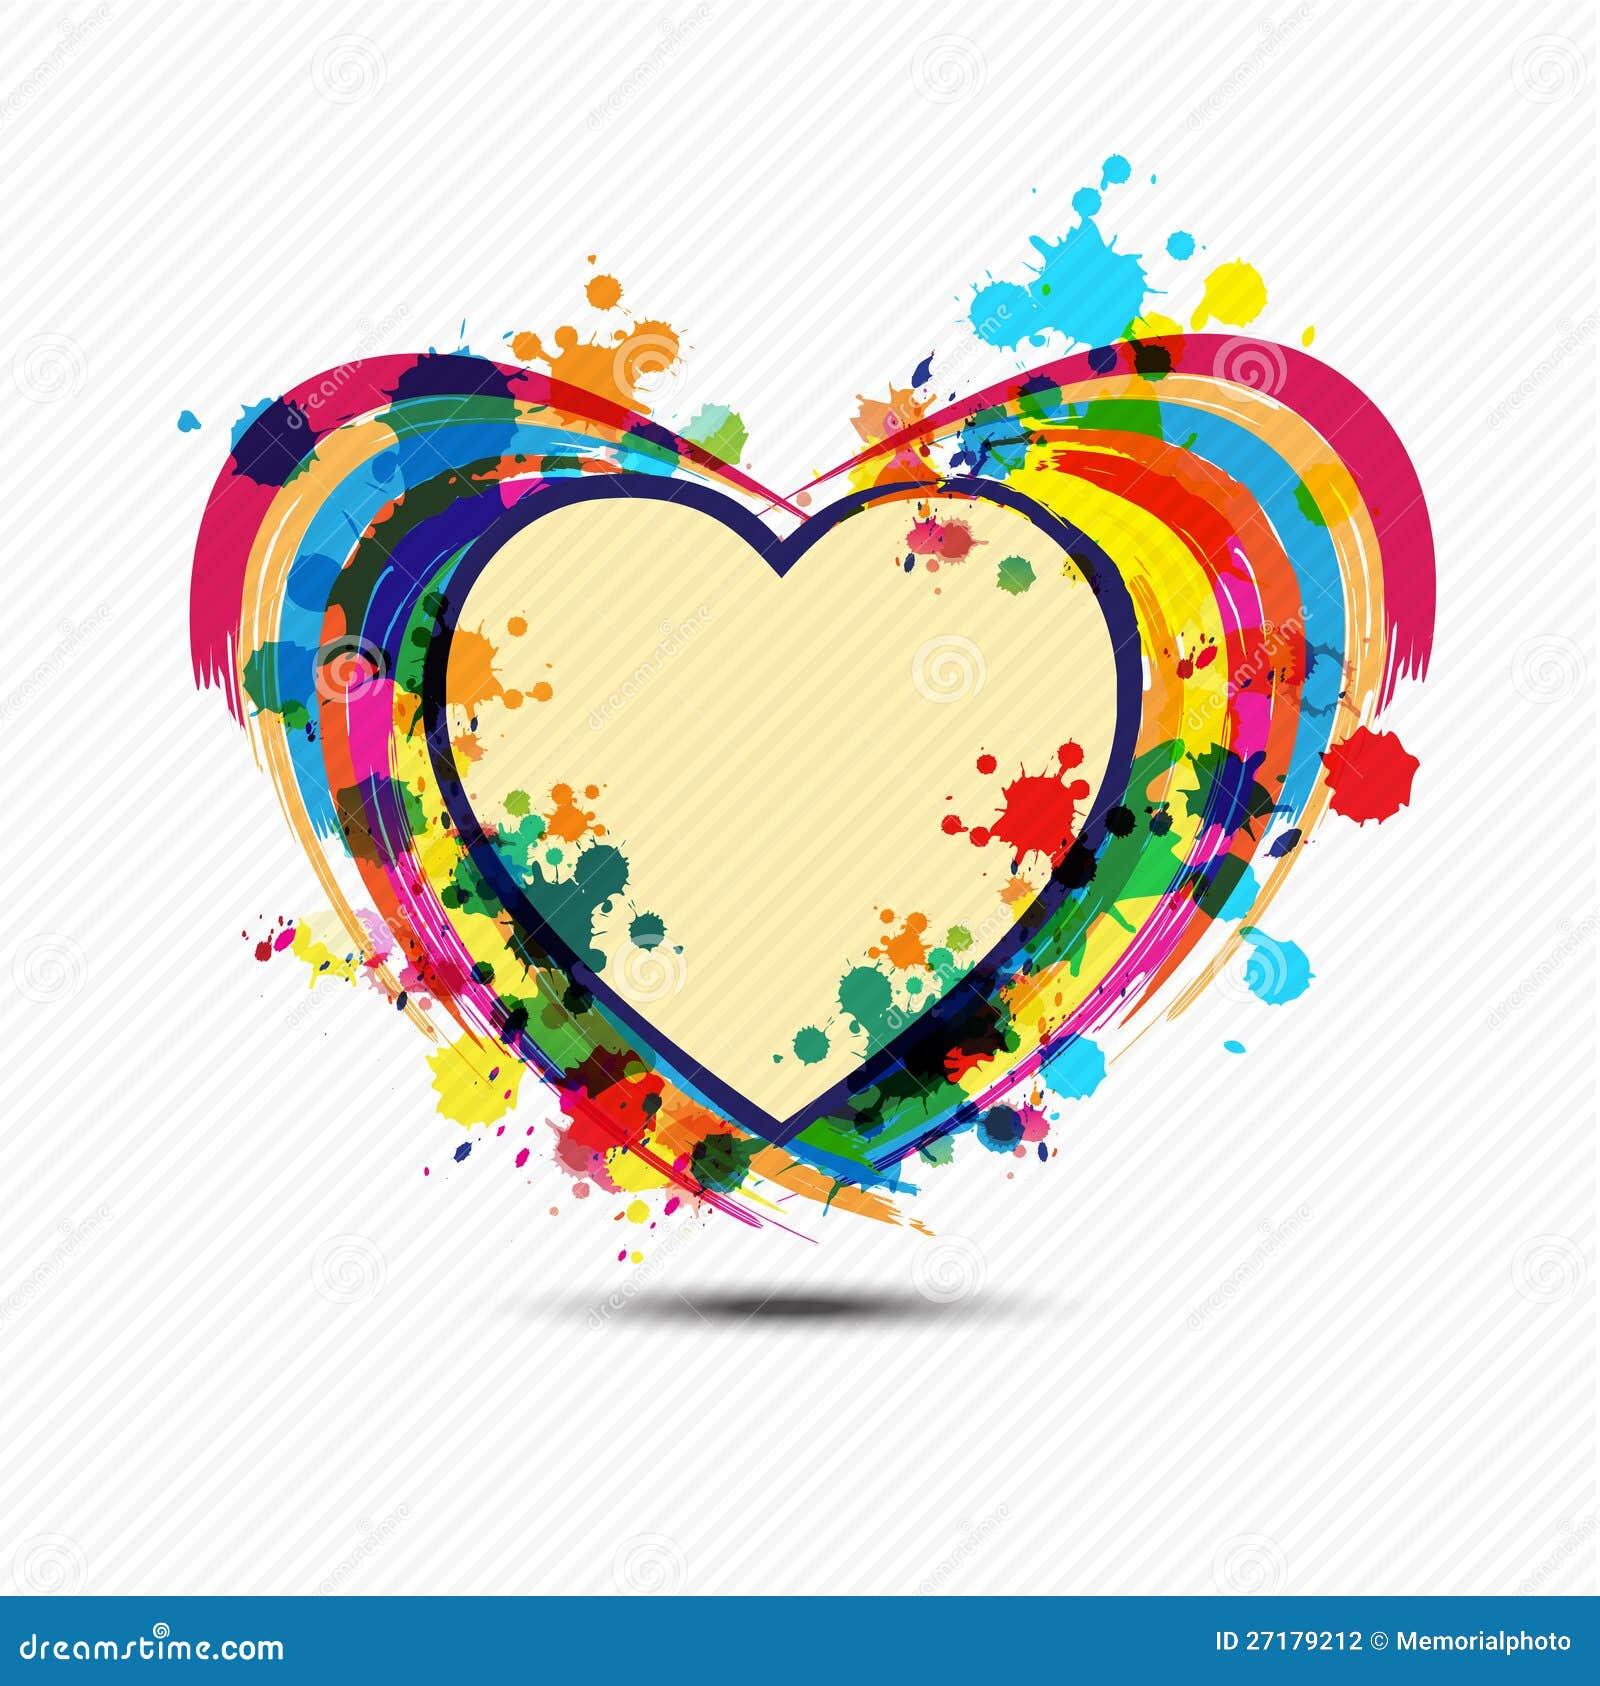 Artistic Heart Paint Design Stock Illustration - Illustration of ...